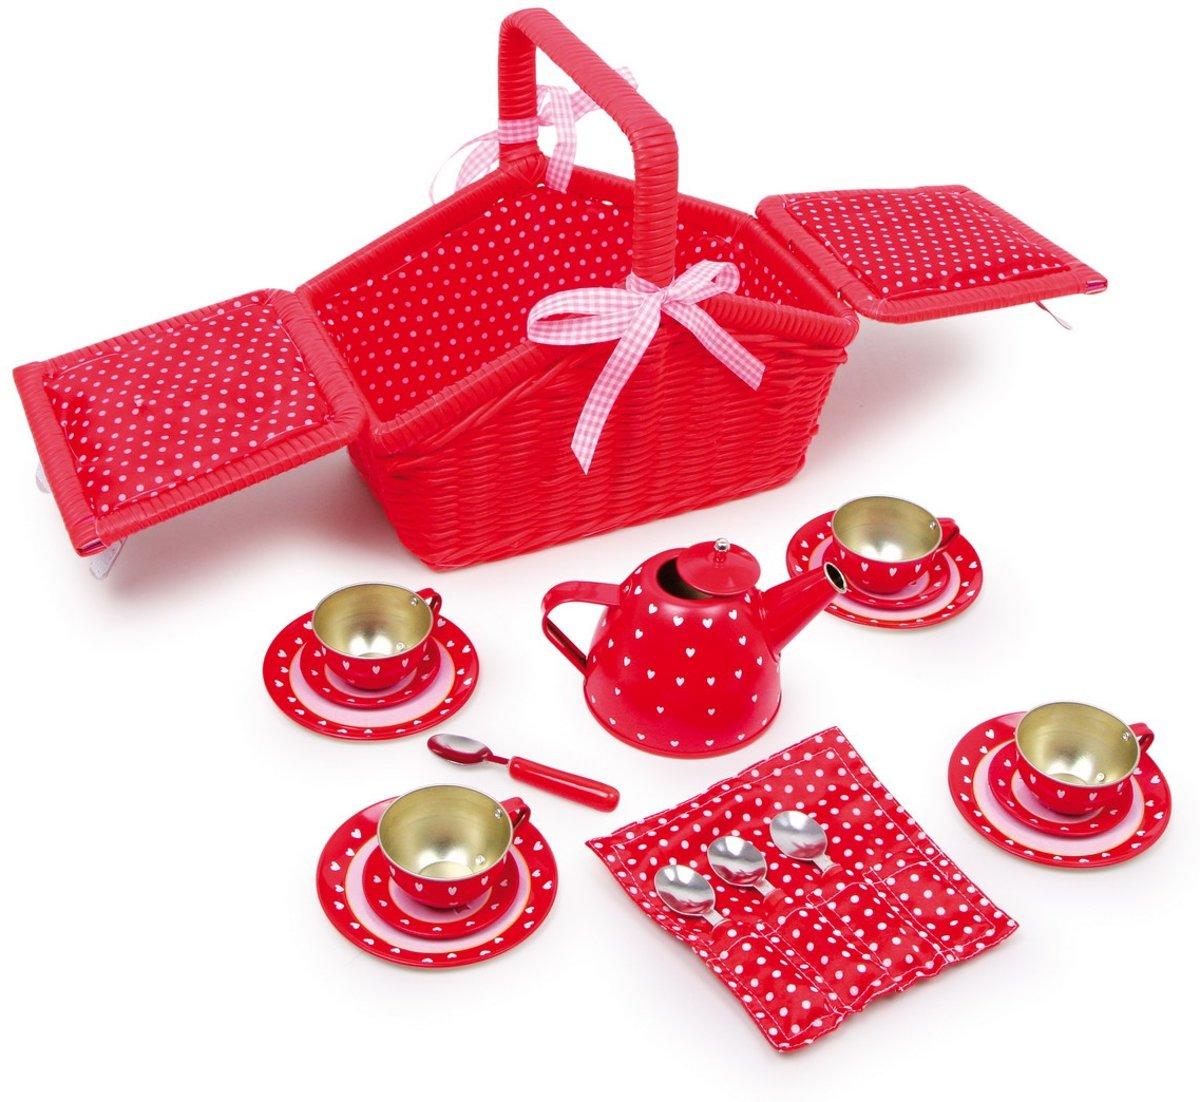 Picknickmand met kinder servies